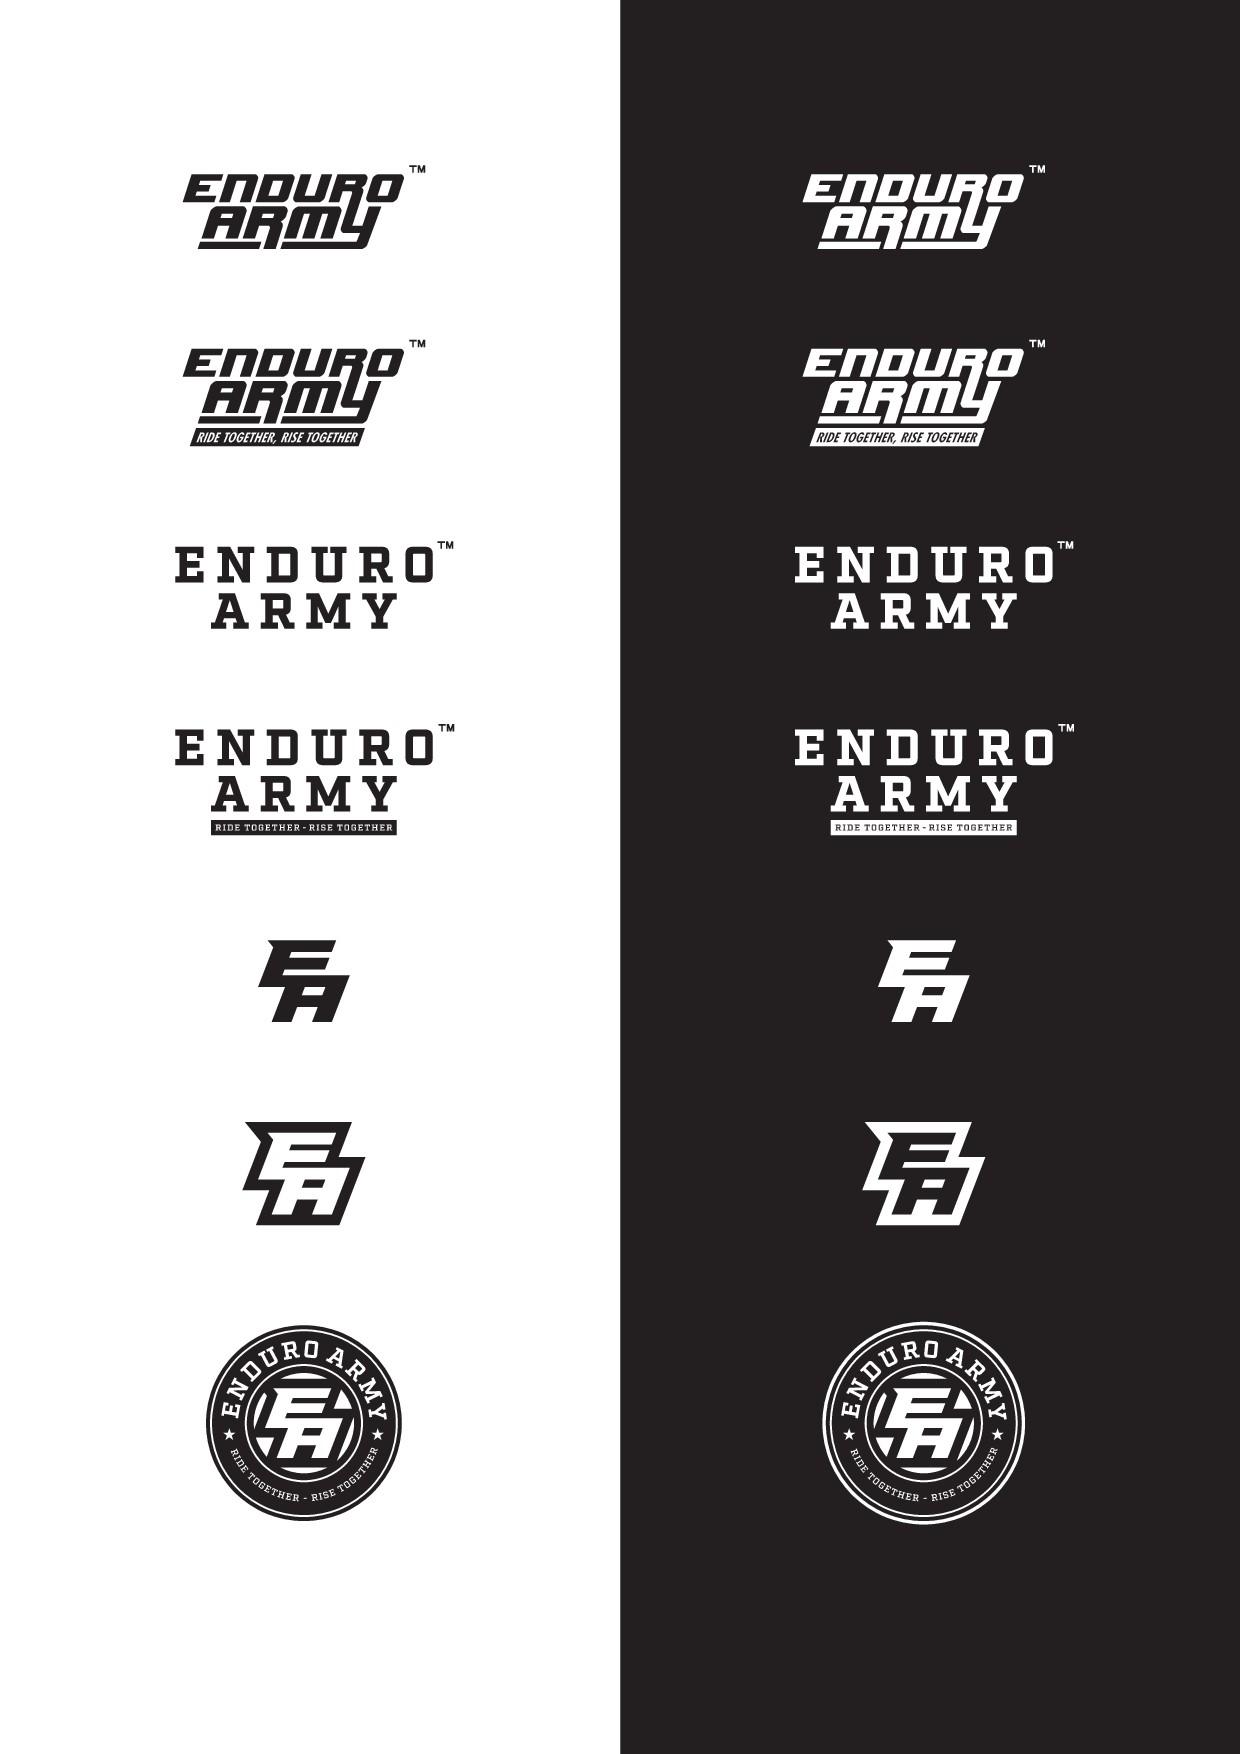 Need a strong logo for new Enduro Dirt Biking biz/community